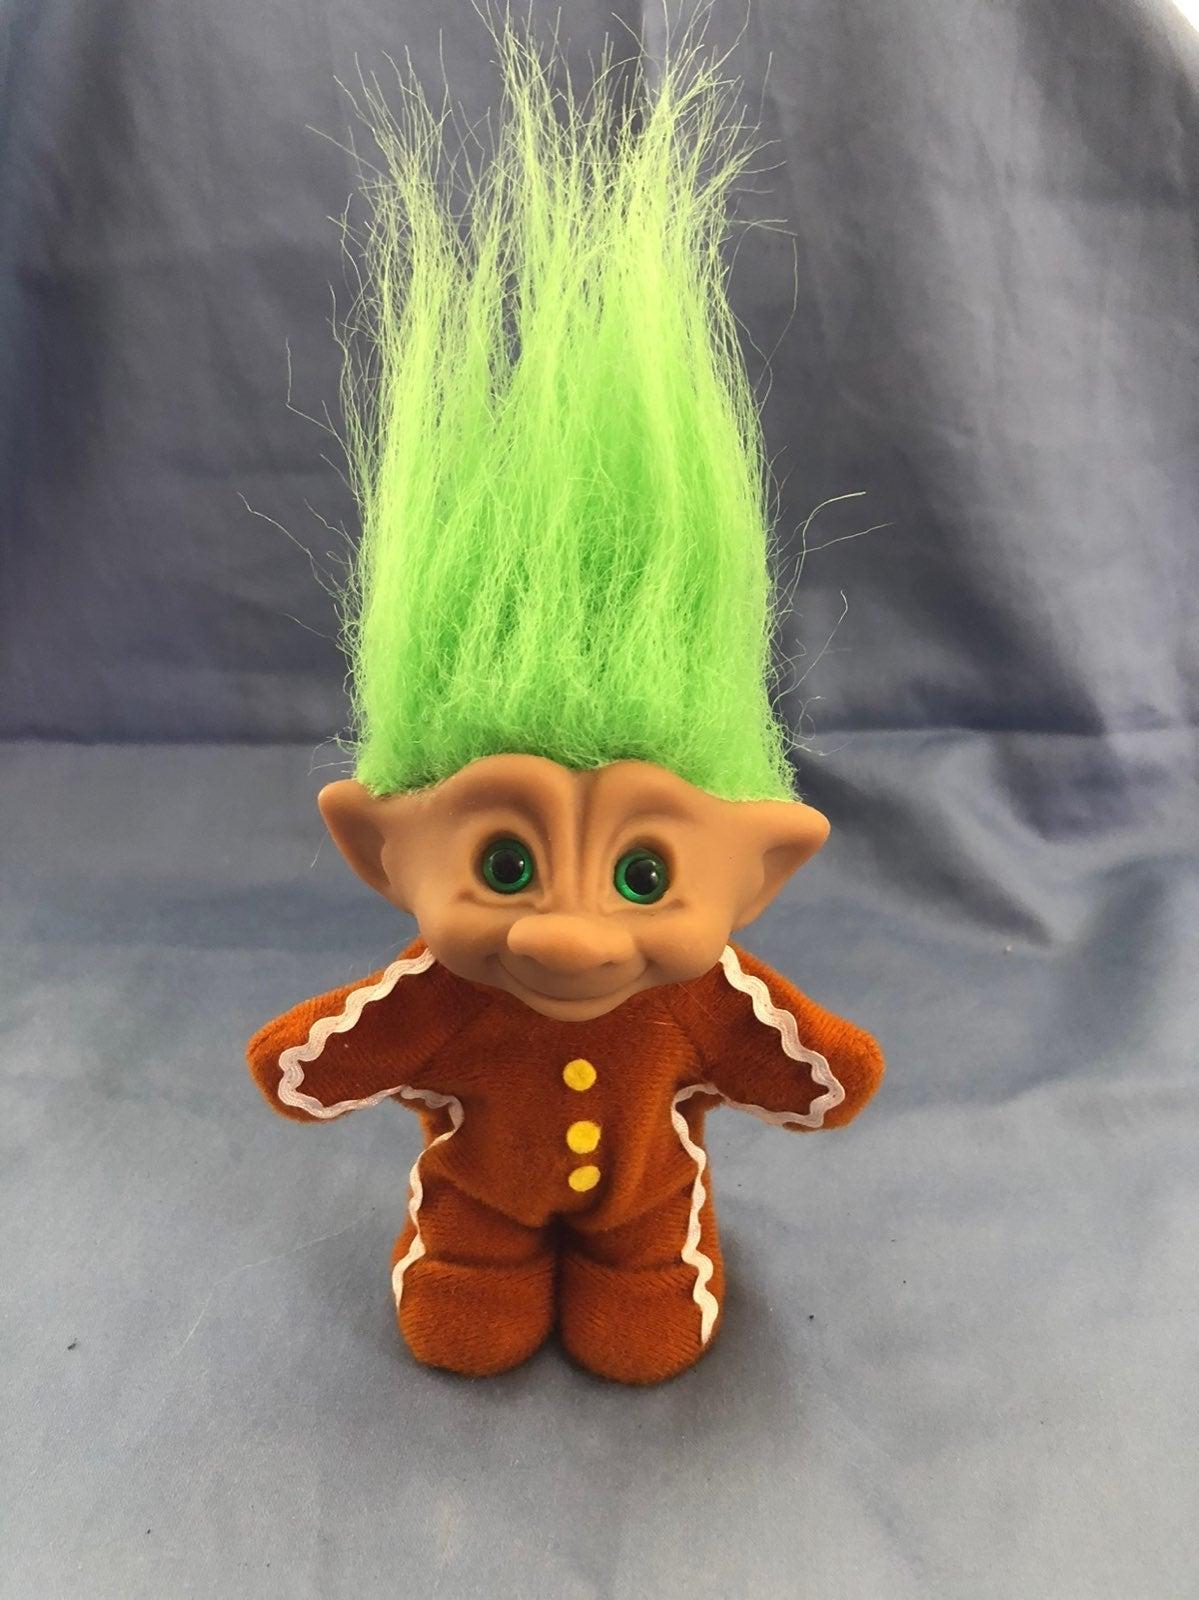 Vintage Russ Troll Gingerbread Man